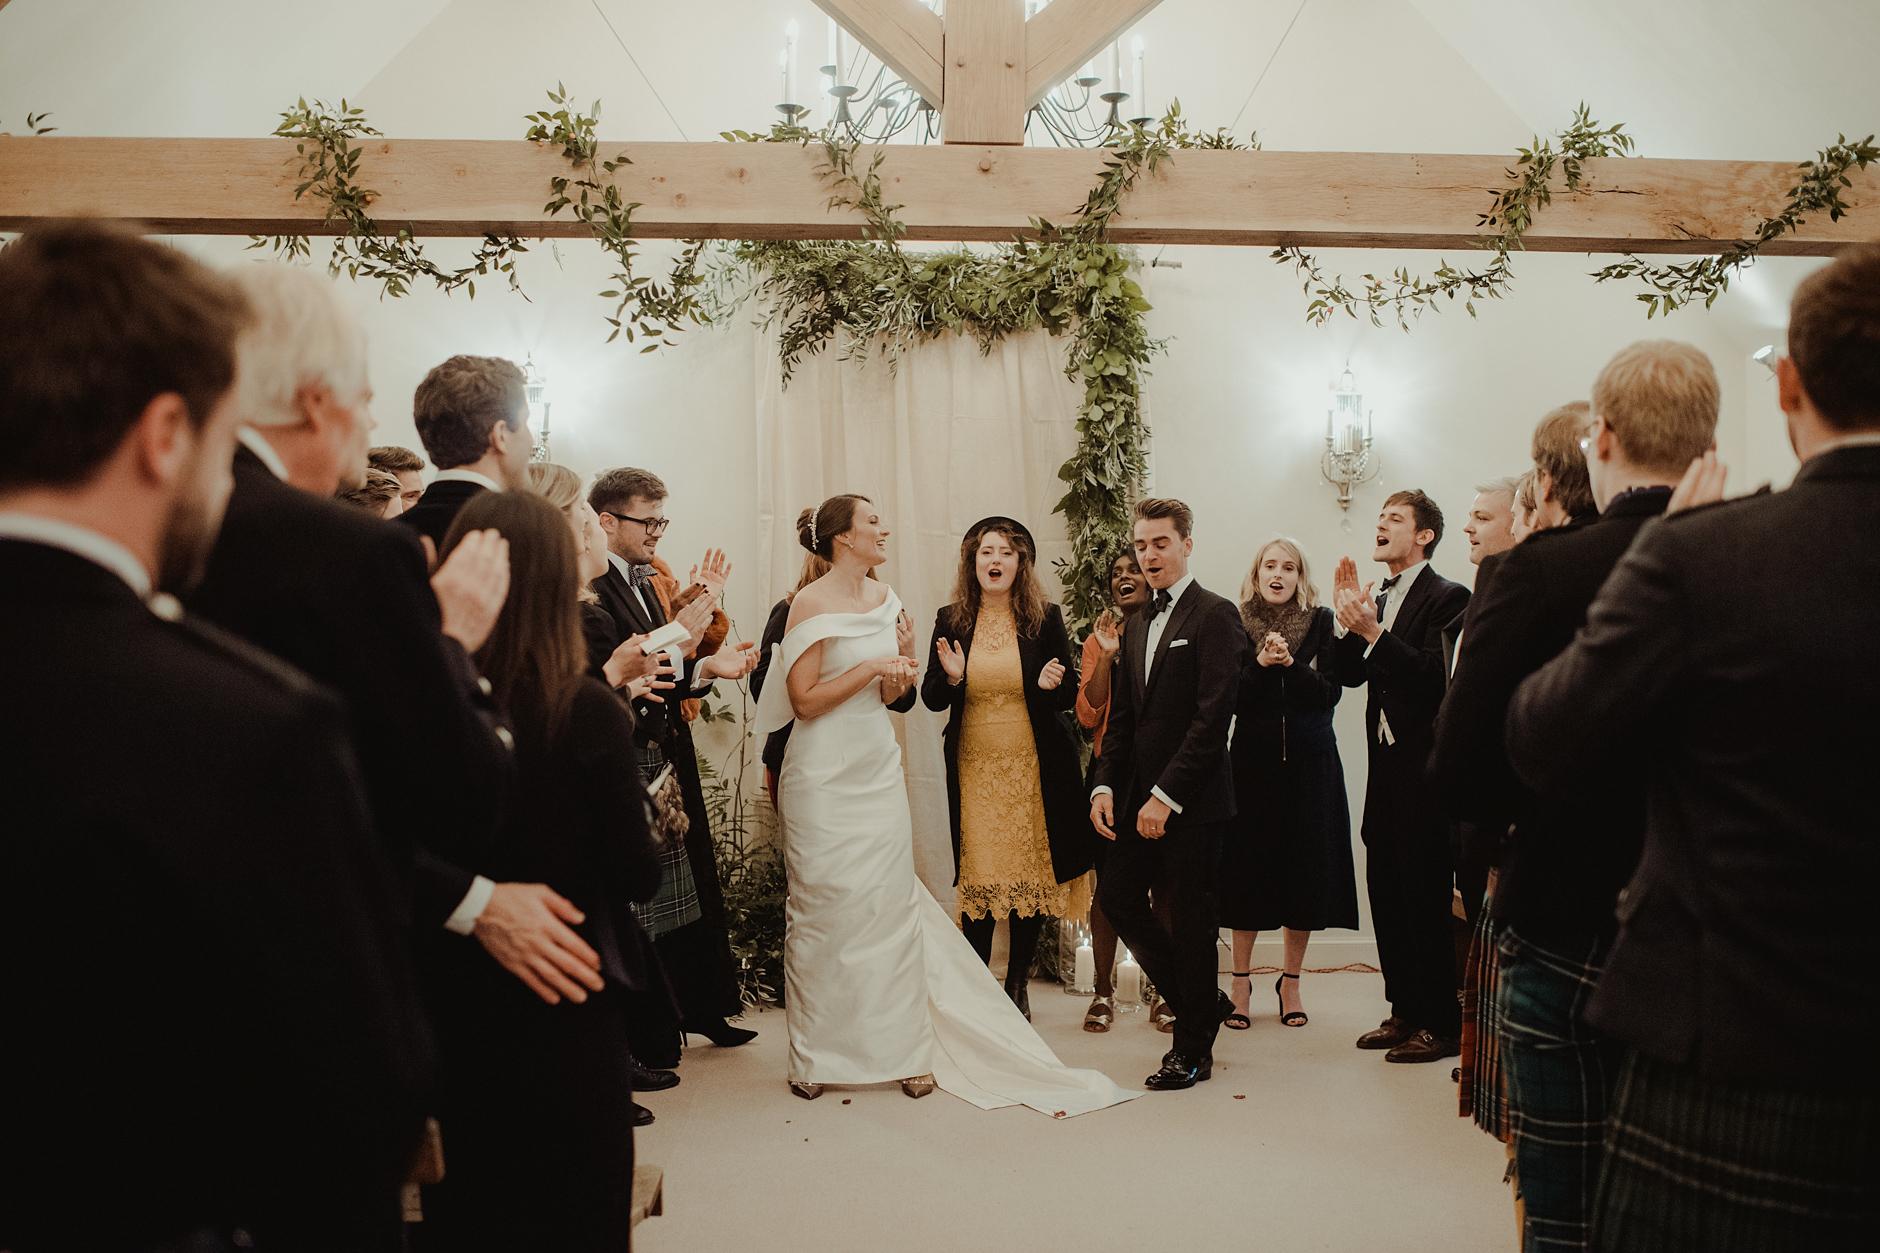 Glentruim-Wedding-Nikki-Leadbetter-Photography-105.jpg